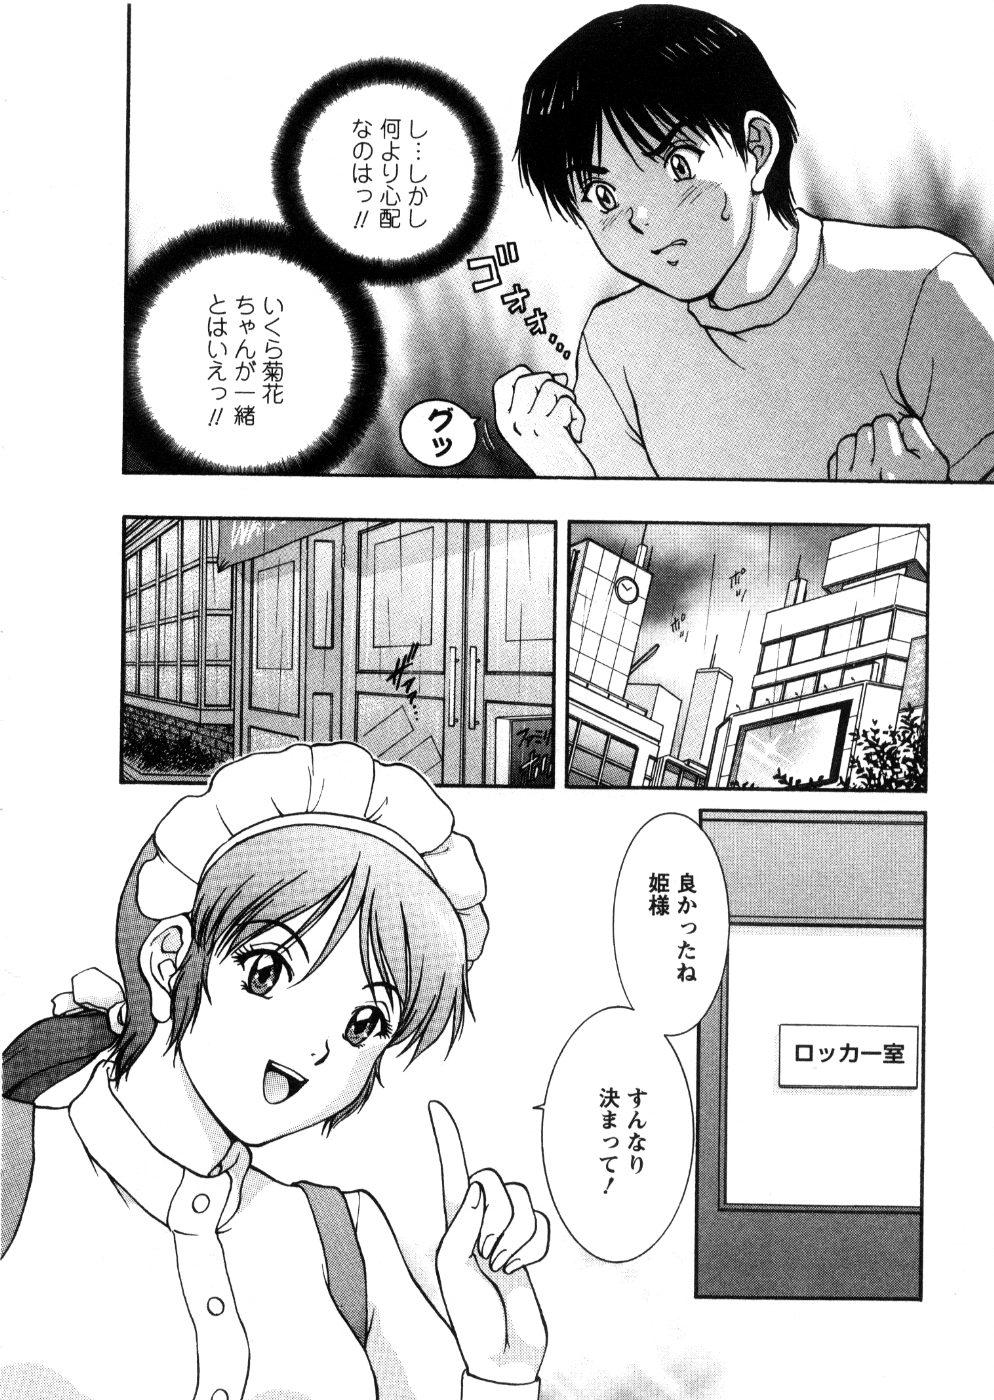 Oneechan-tachi ga Yatte Kuru 03 75